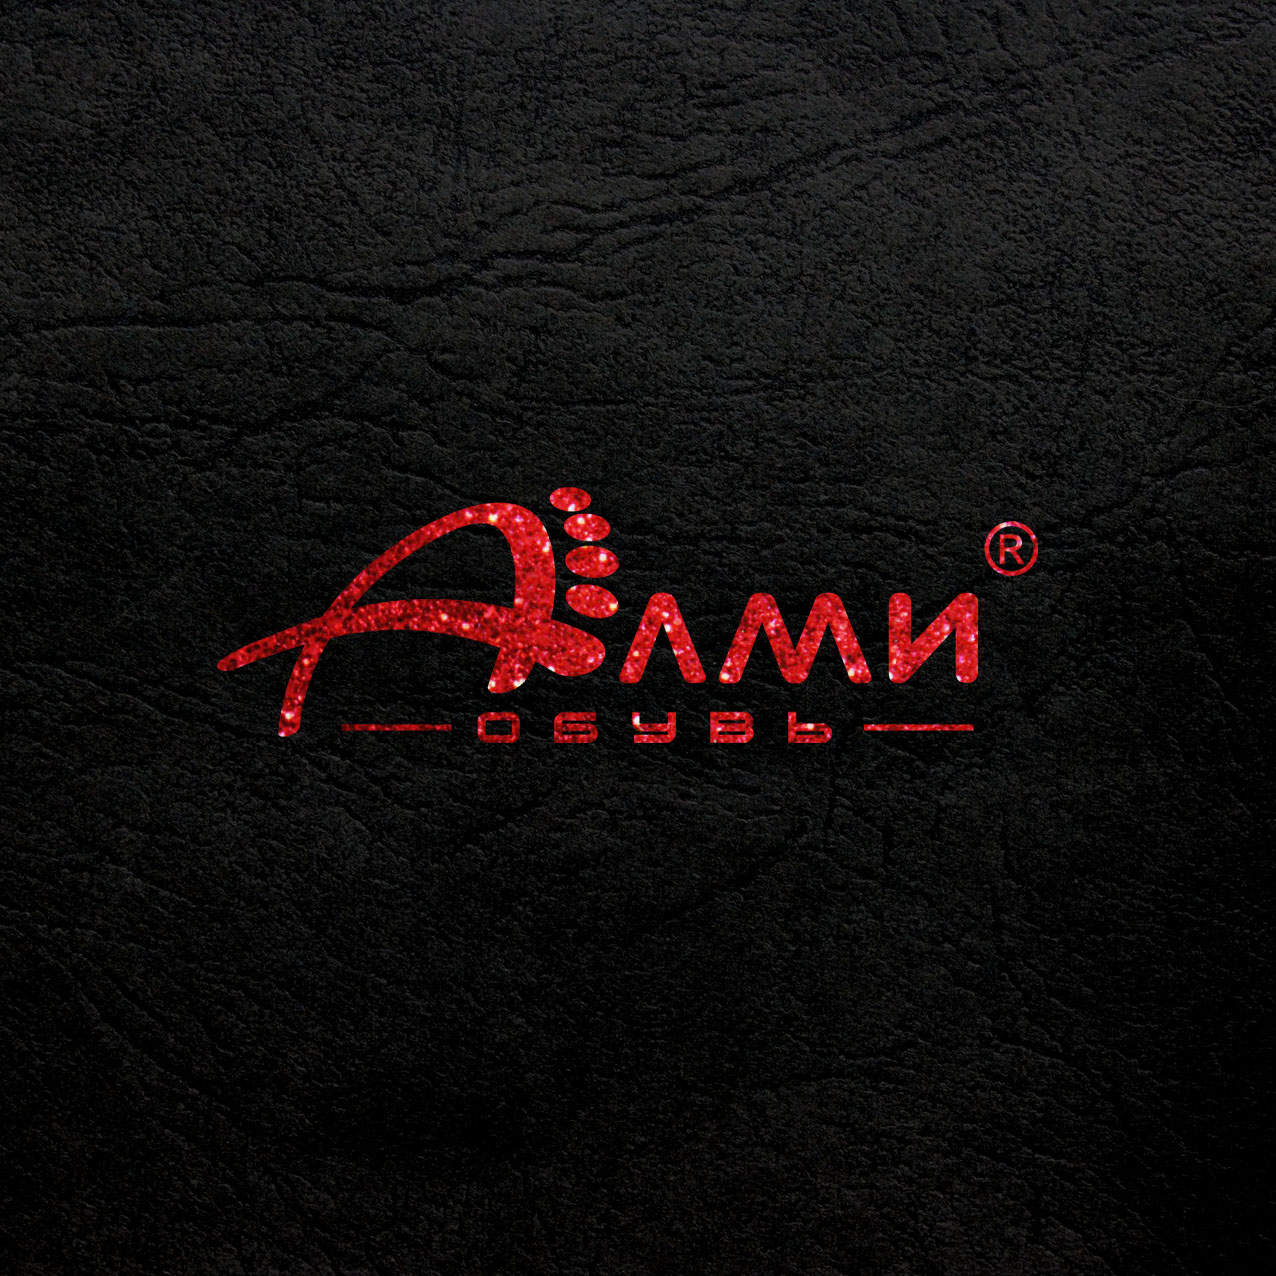 Дизайн логотипа обувной марки Алми фото f_07359f1d2169ff9e.jpg